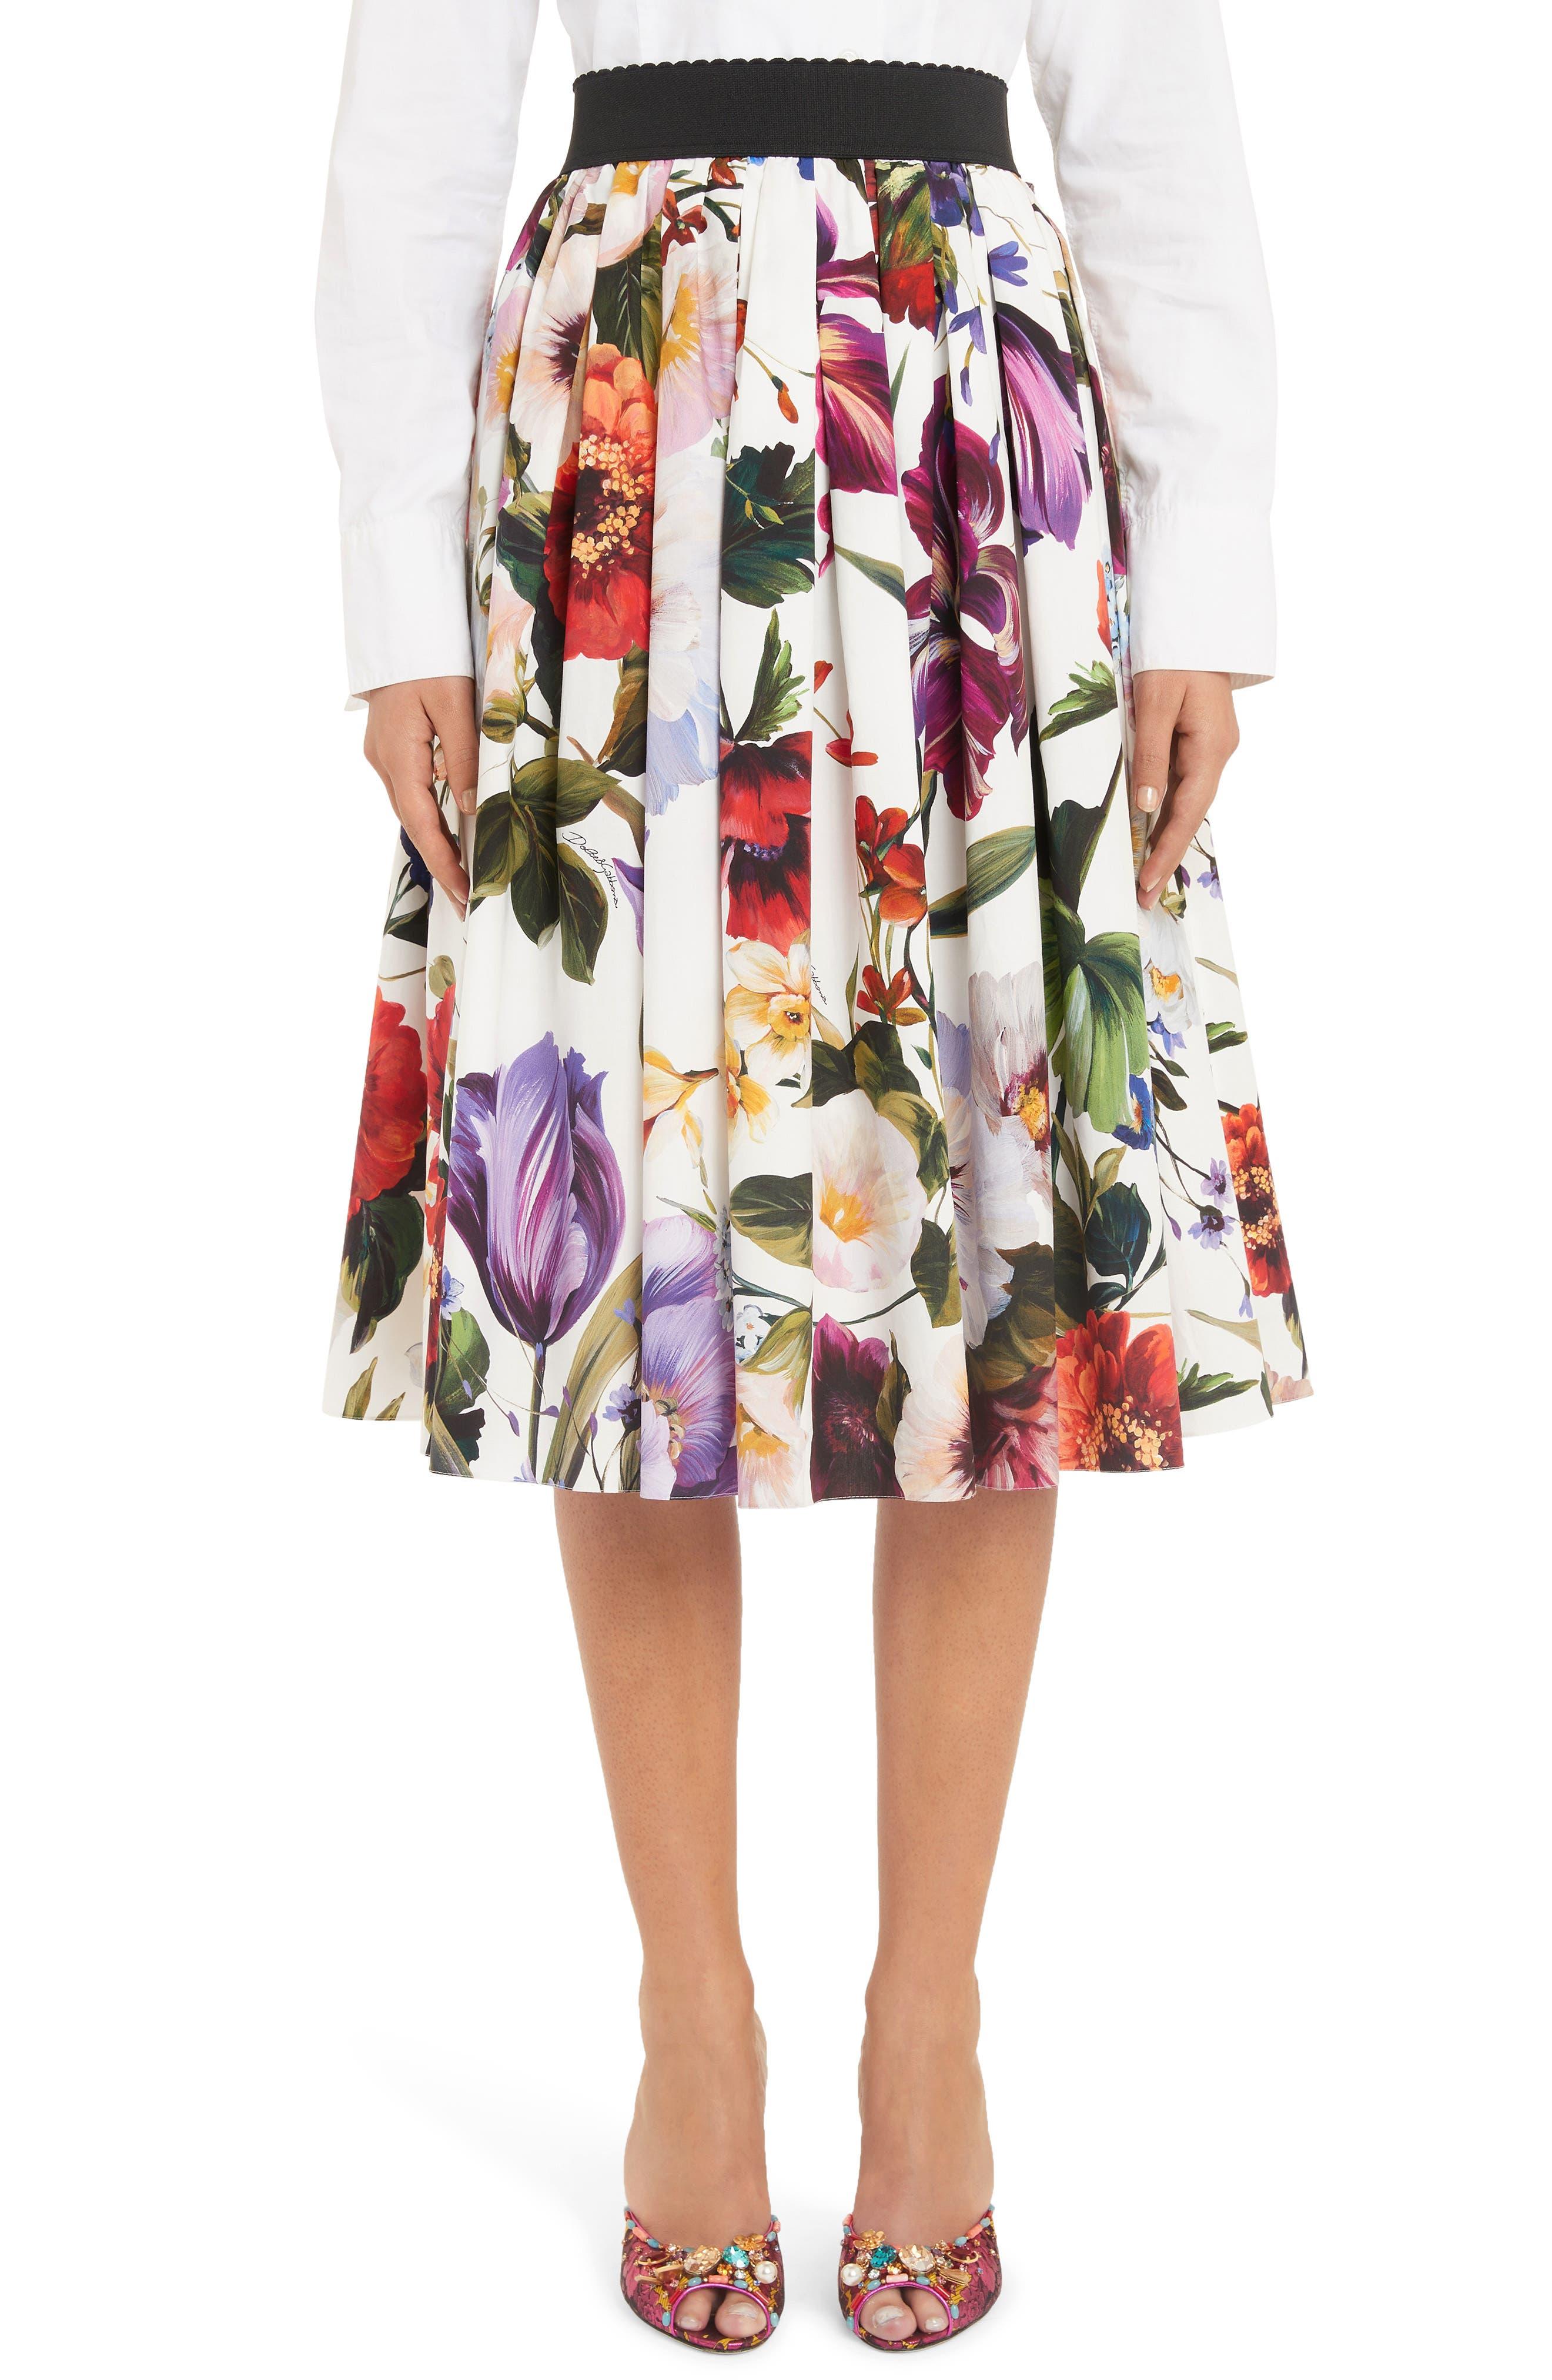 DOLCE&GABBANA, Floral Print A-Line Poplin Midi Skirt, Main thumbnail 1, color, PRINT